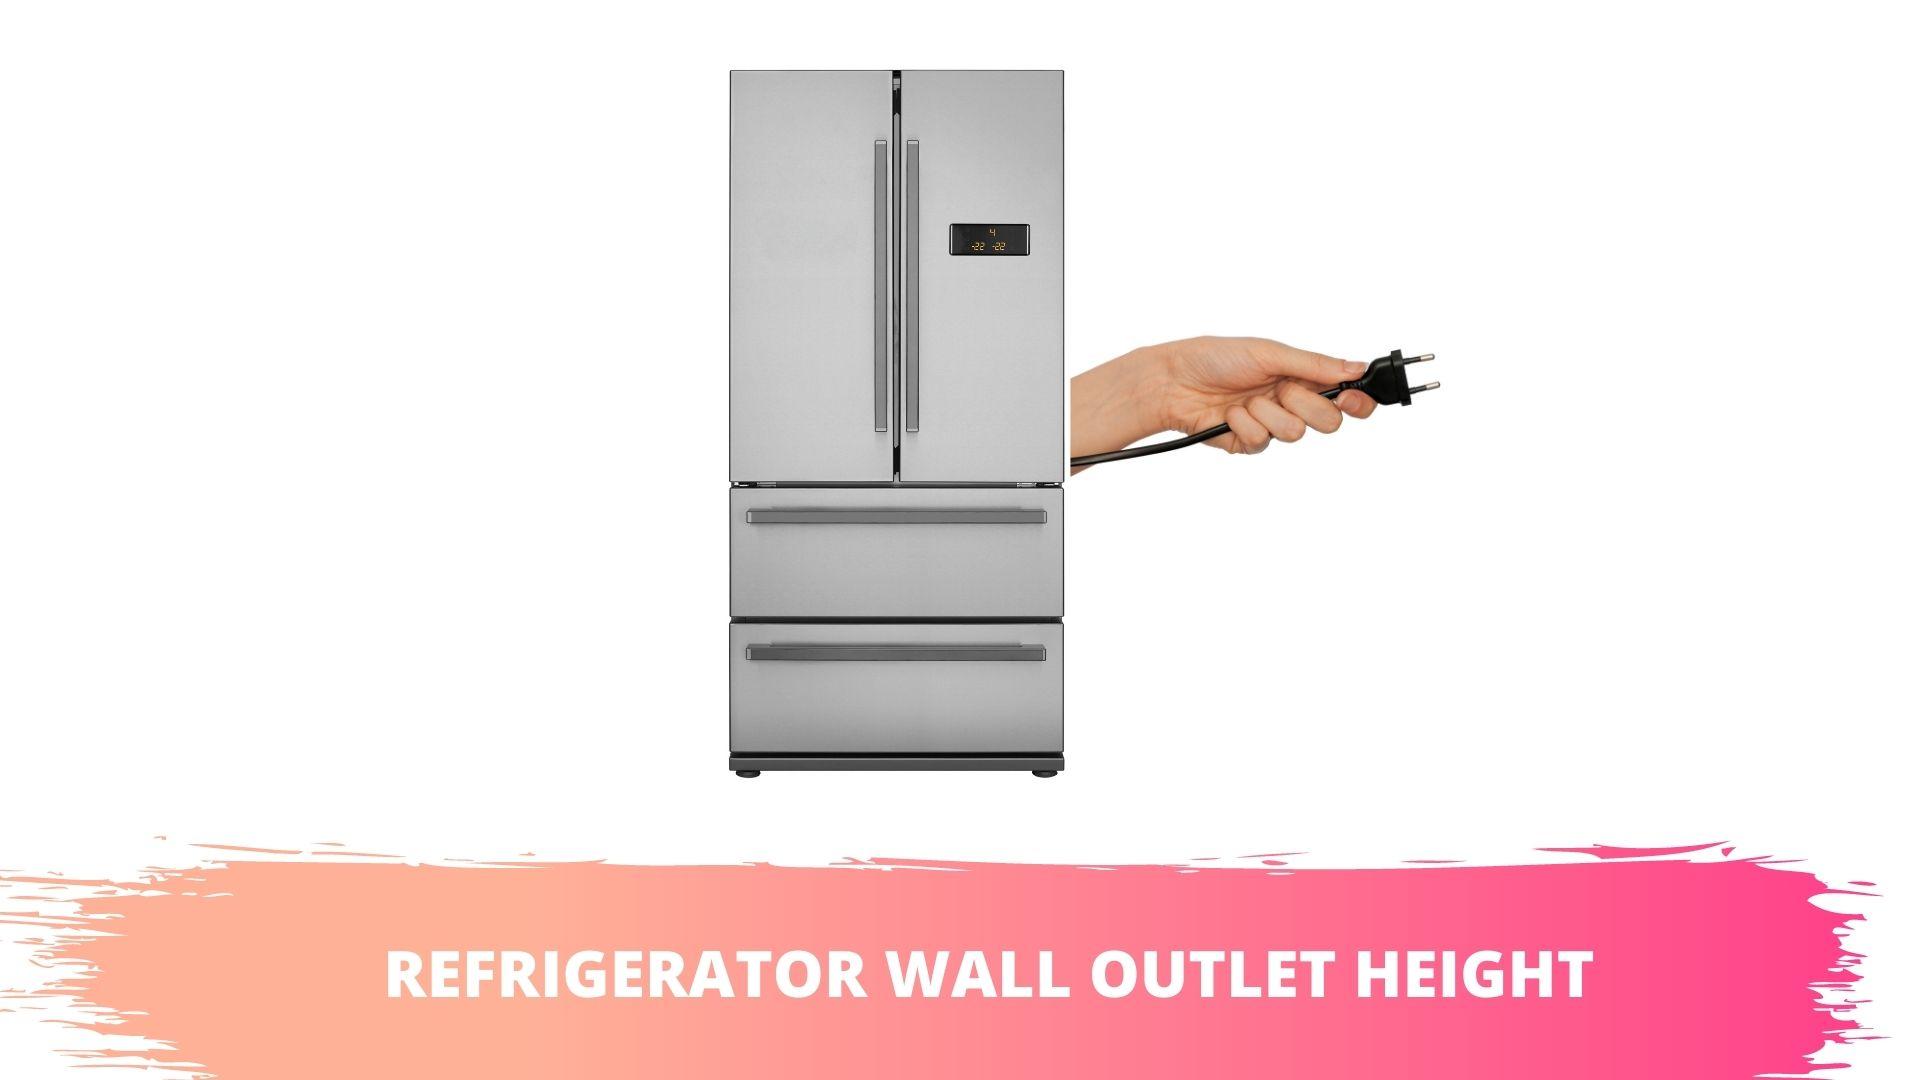 outlet height for fridge